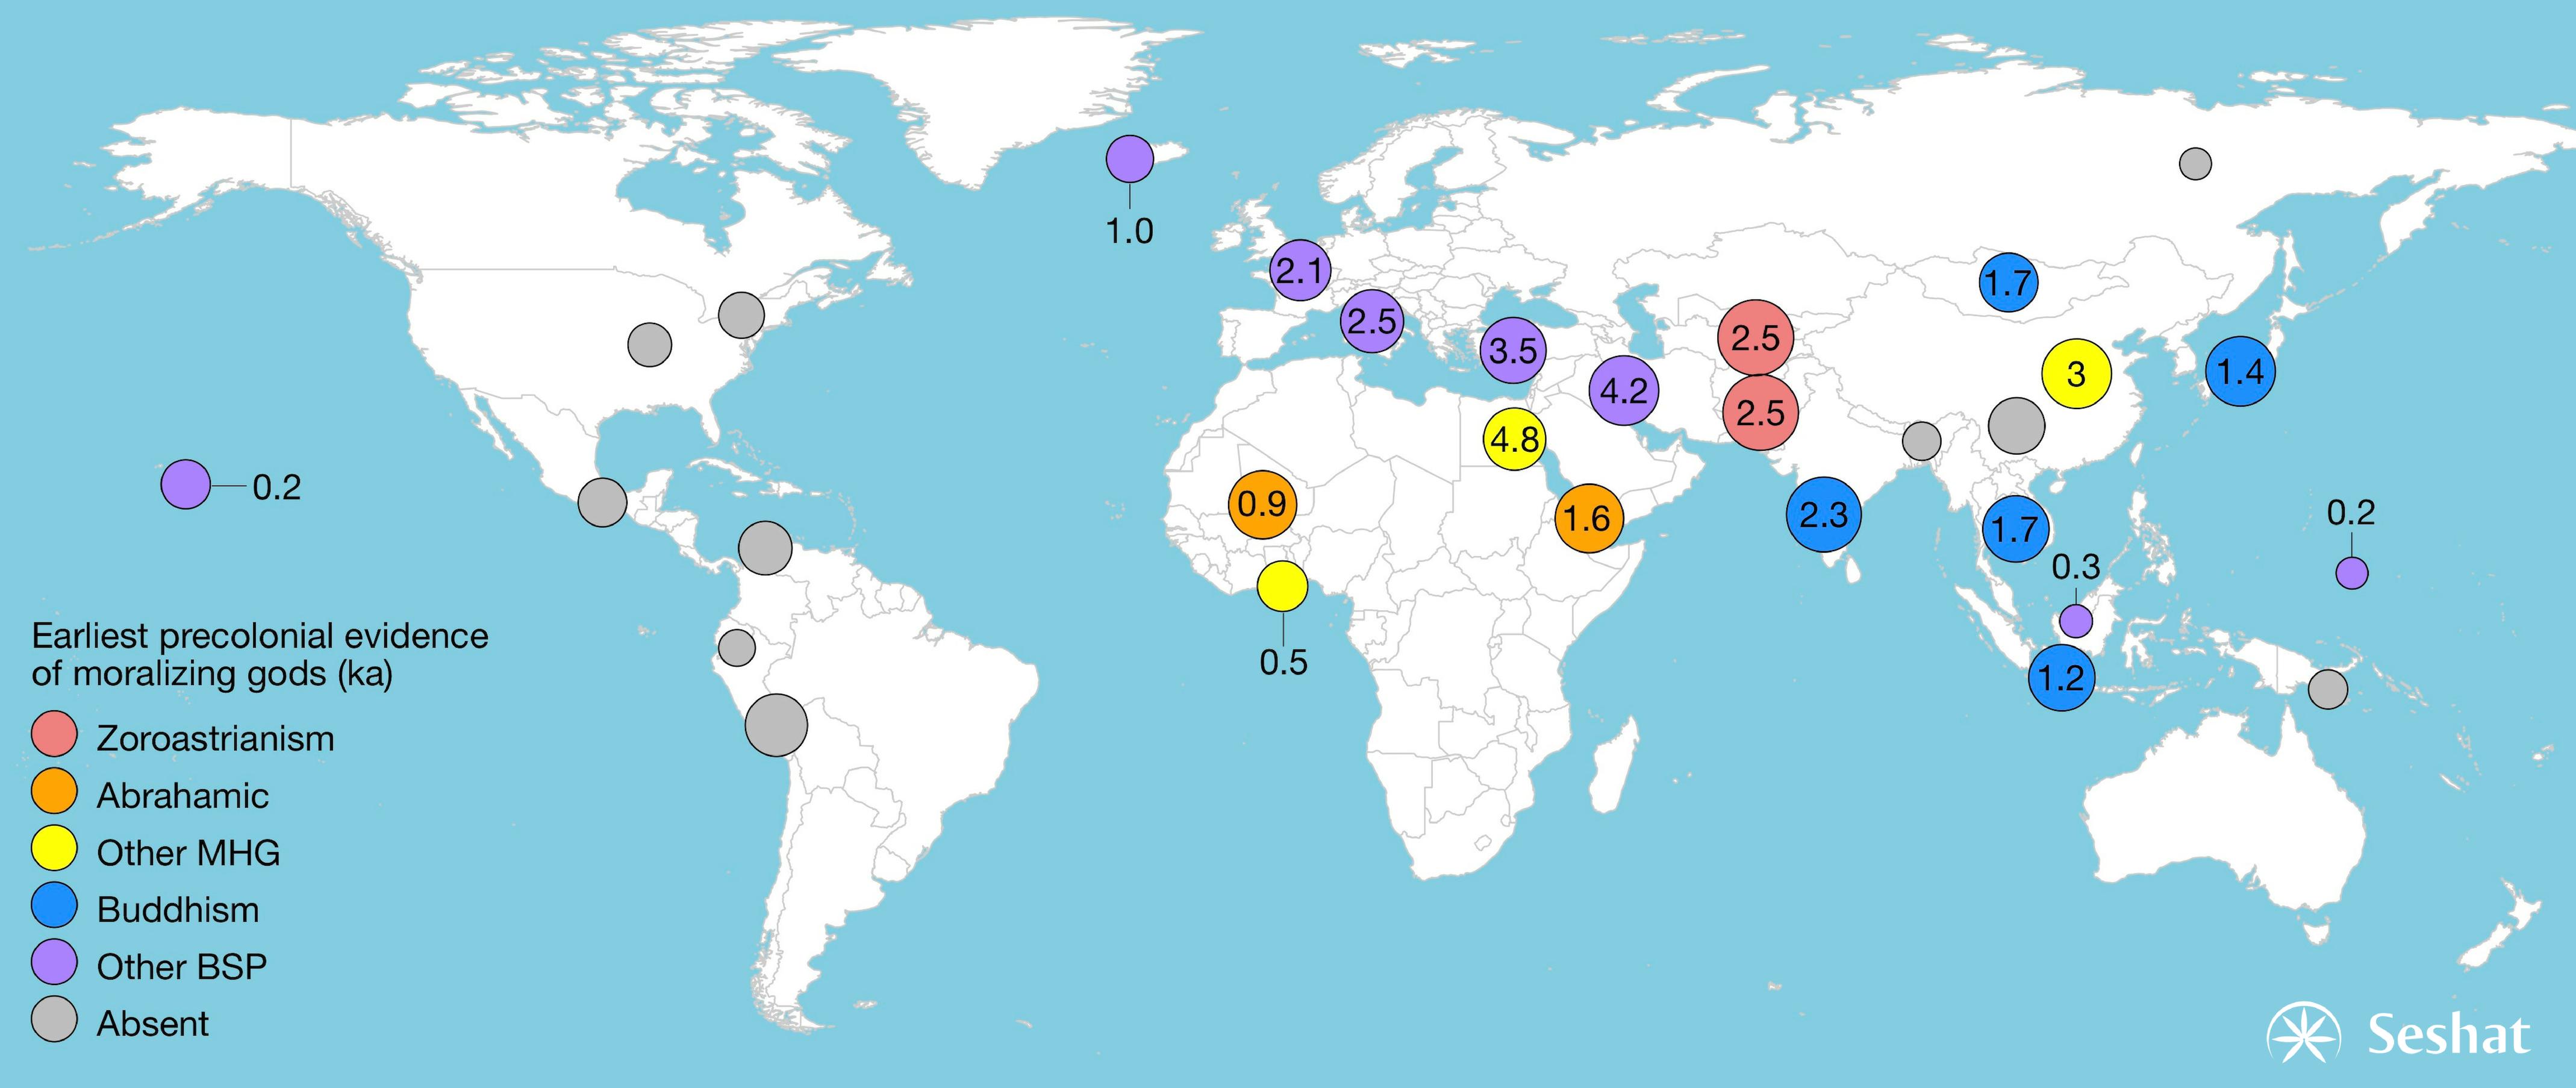 Blog Archives - Seshat: Global History Databank